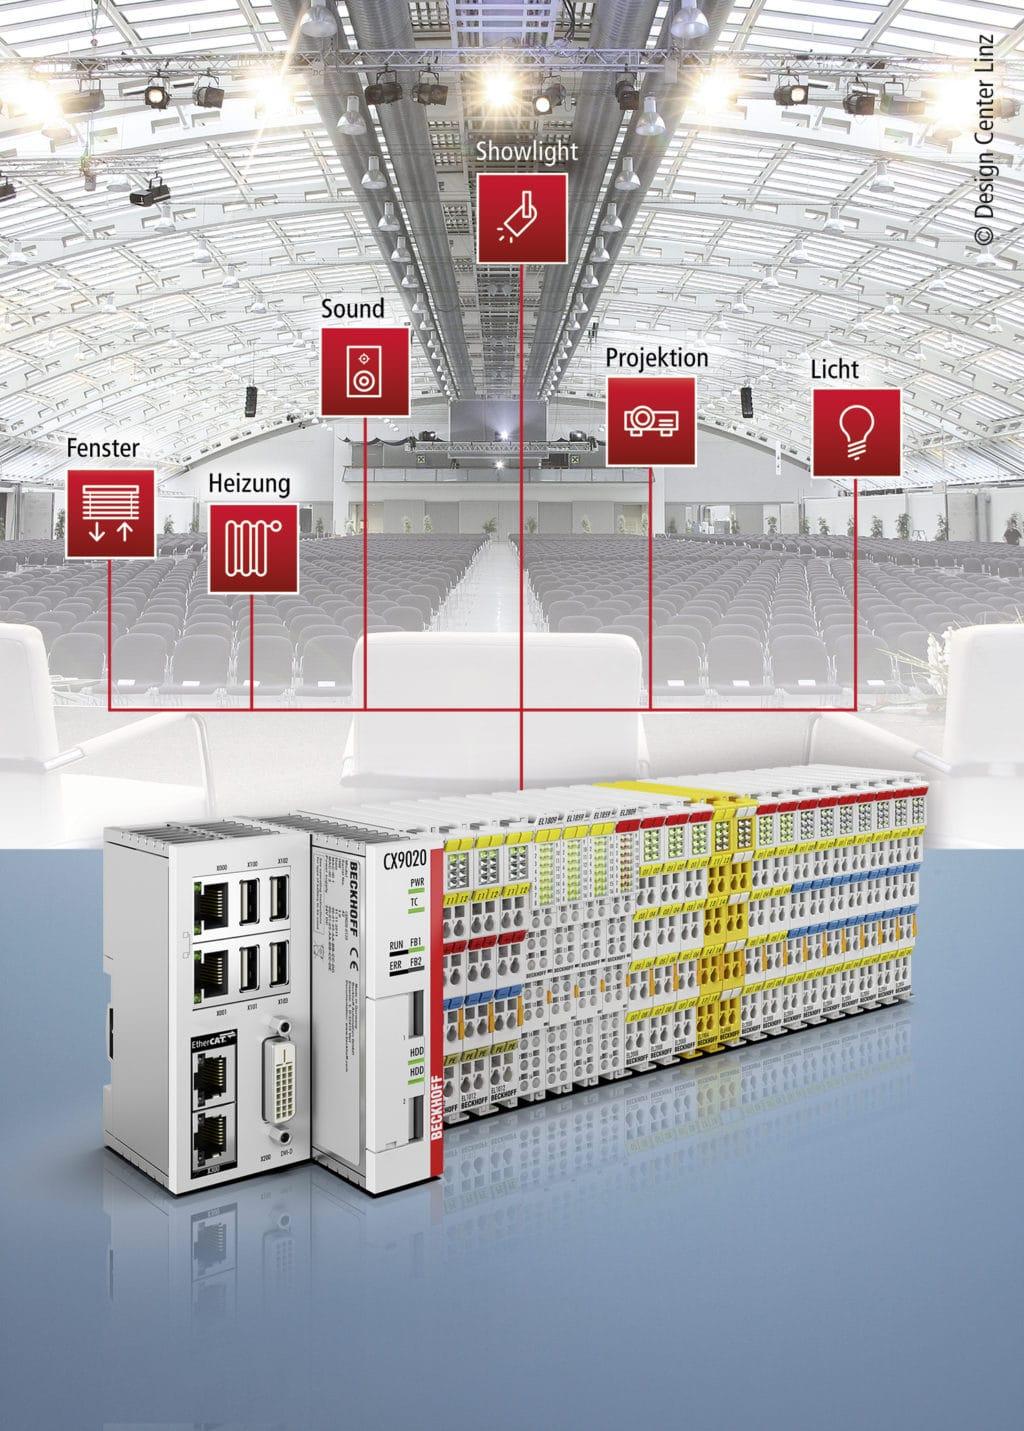 PC-based Control